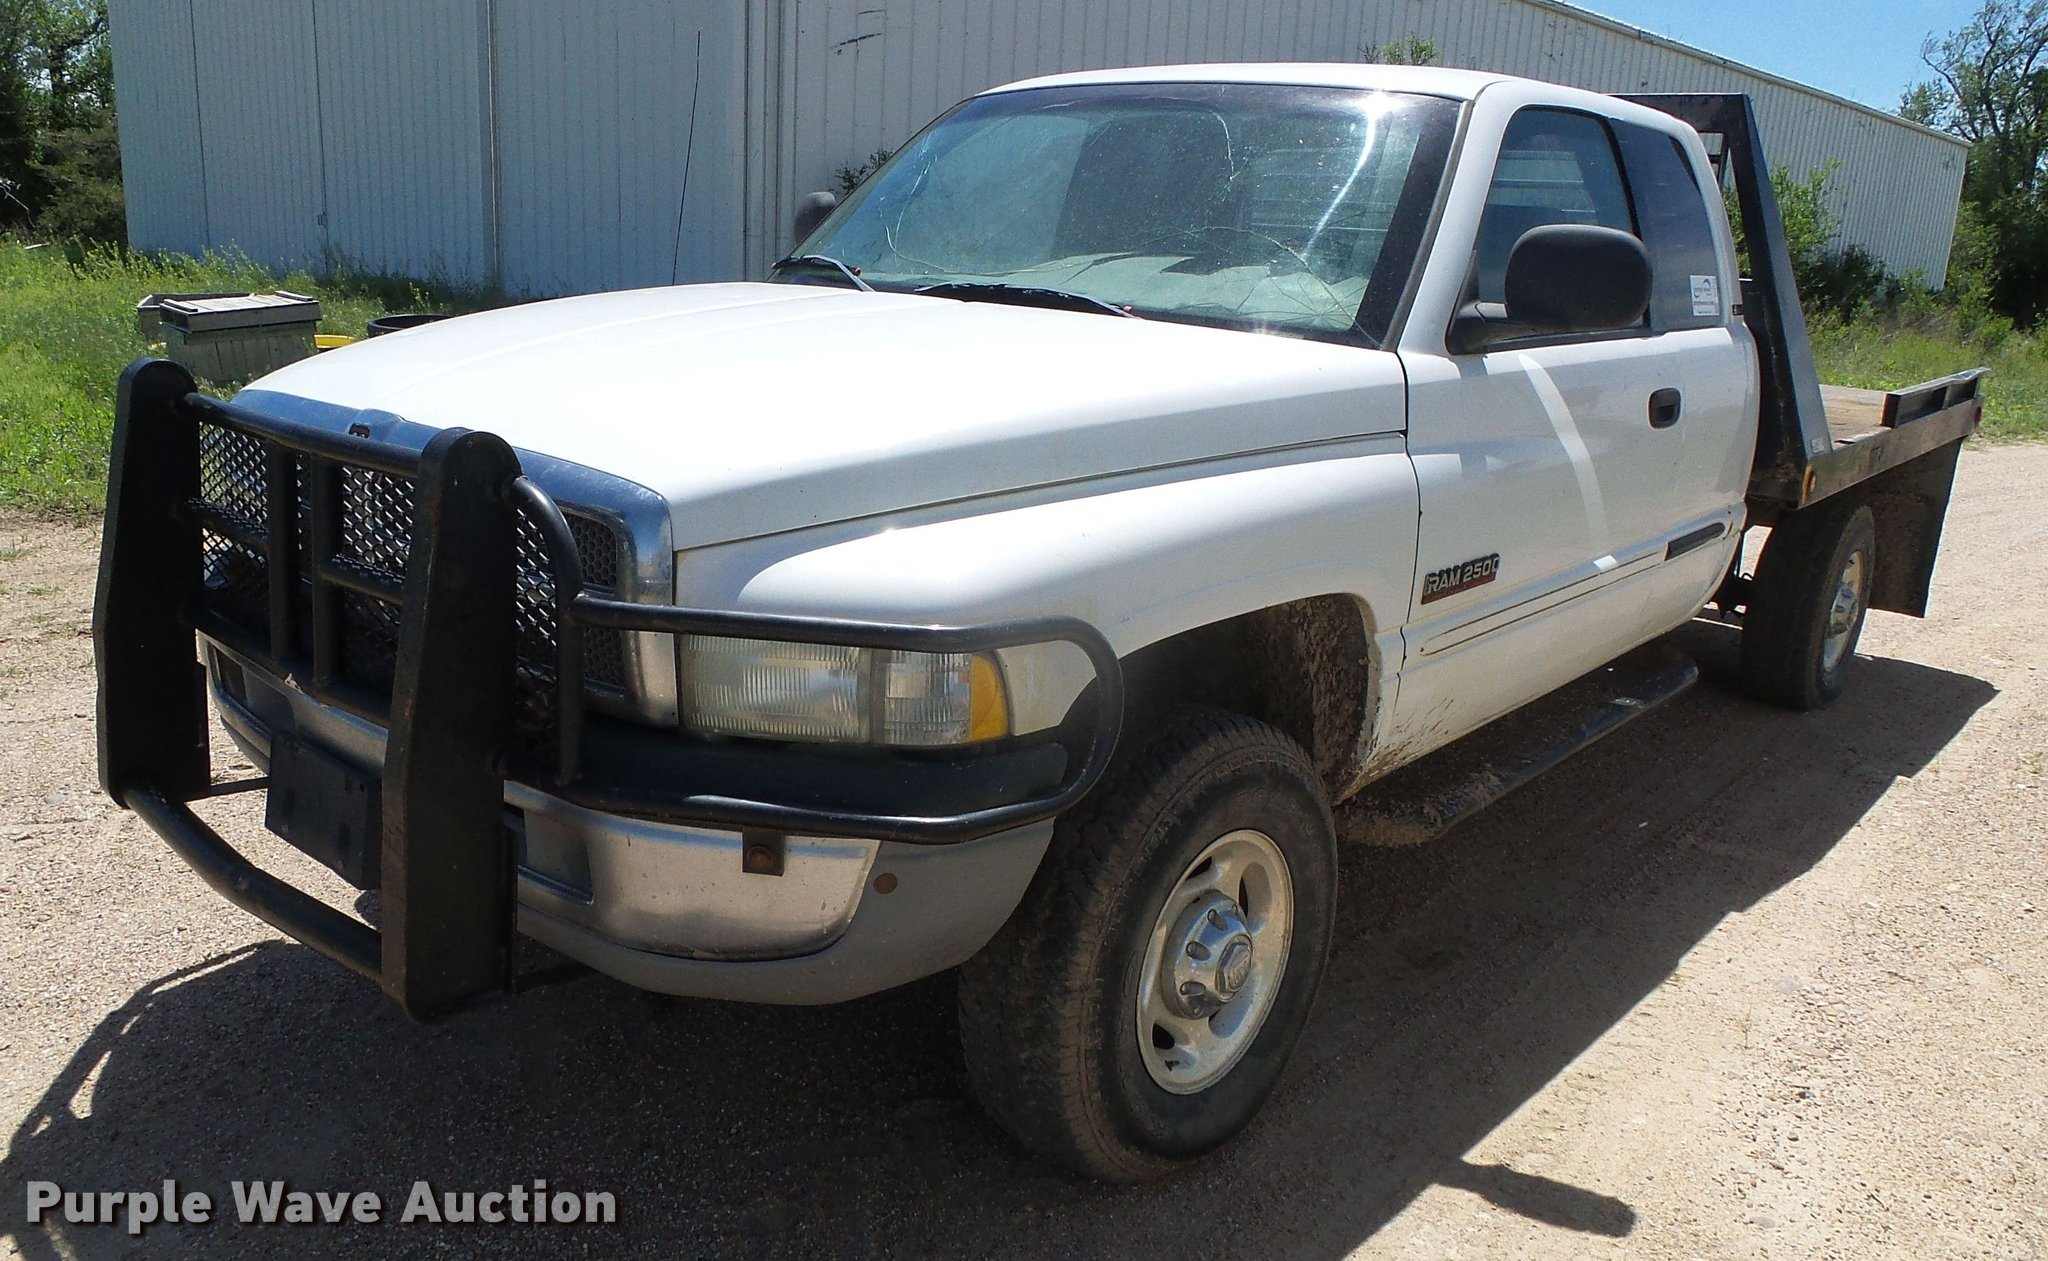 2001 Dodge Ram 2500 Laramie SLT Quad Cab flatbed pickup truc